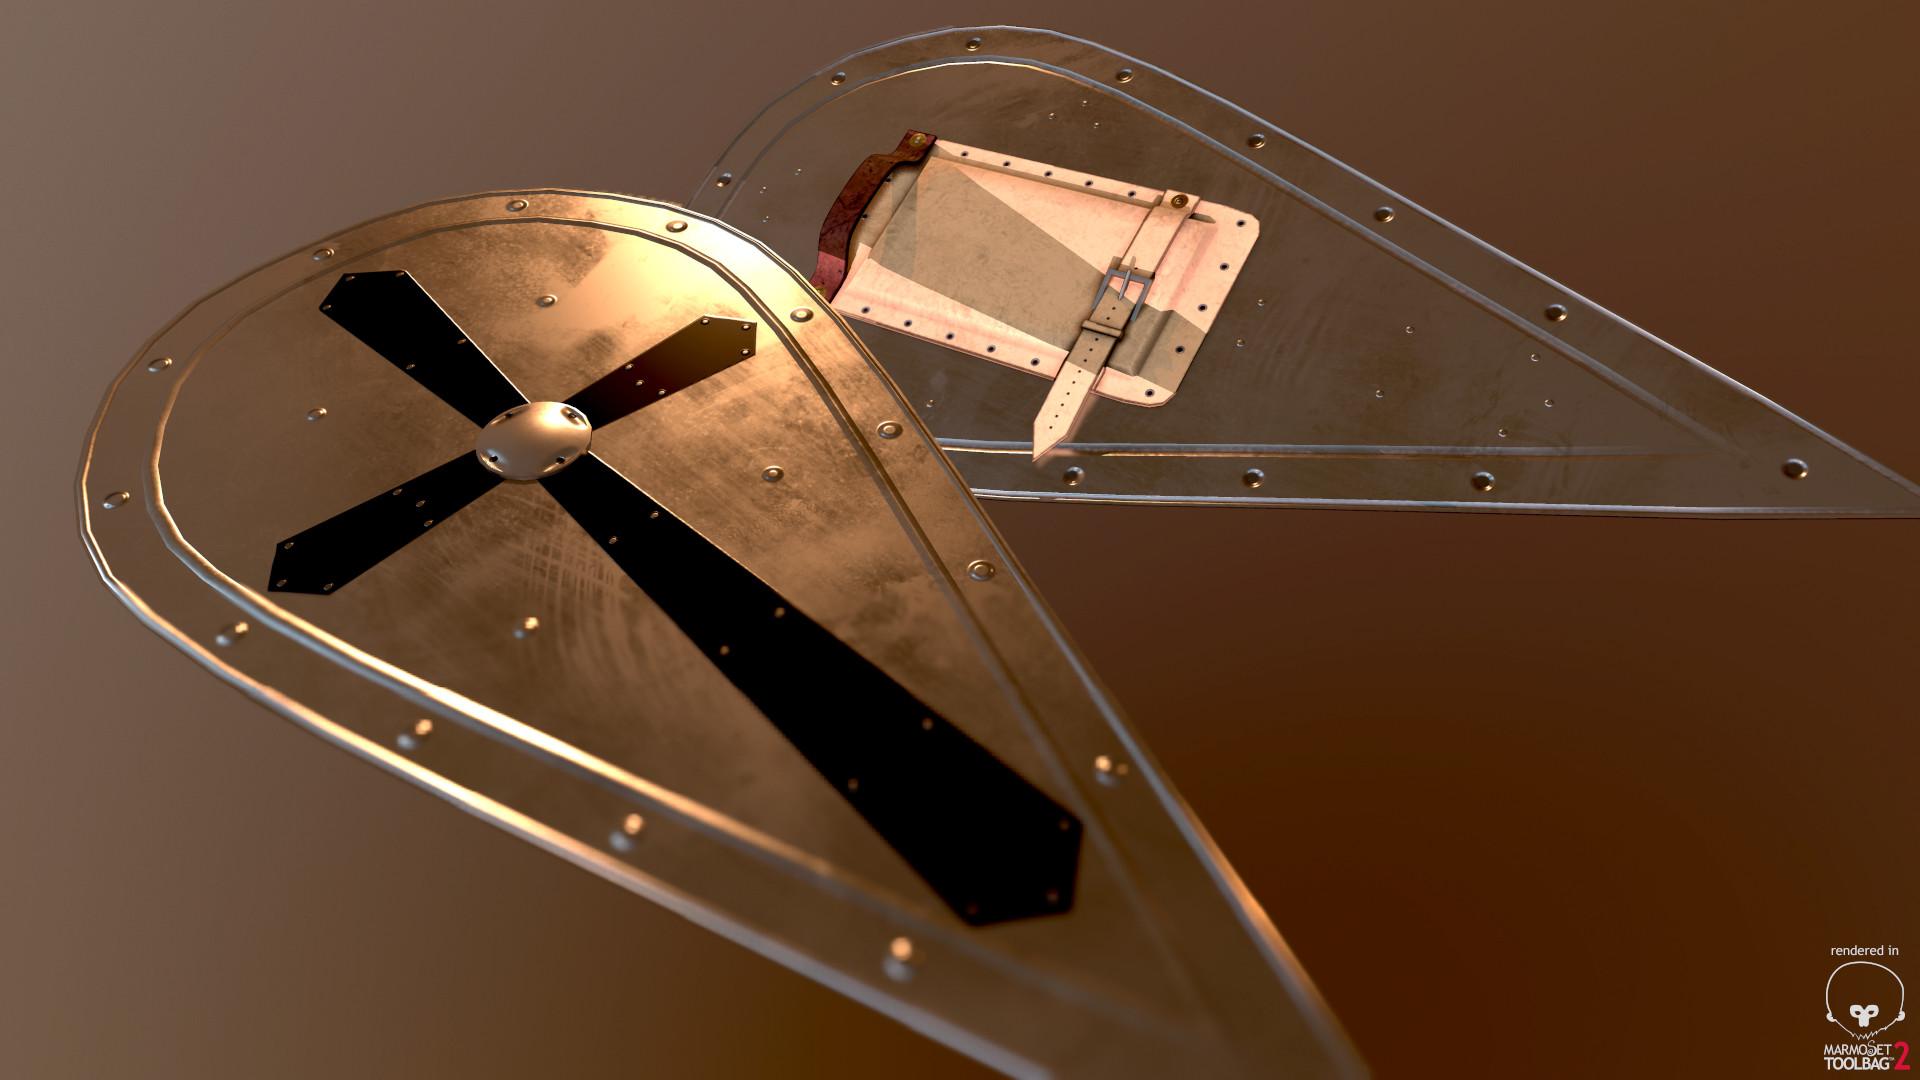 Bela csampai iron norman shield preview mt 01